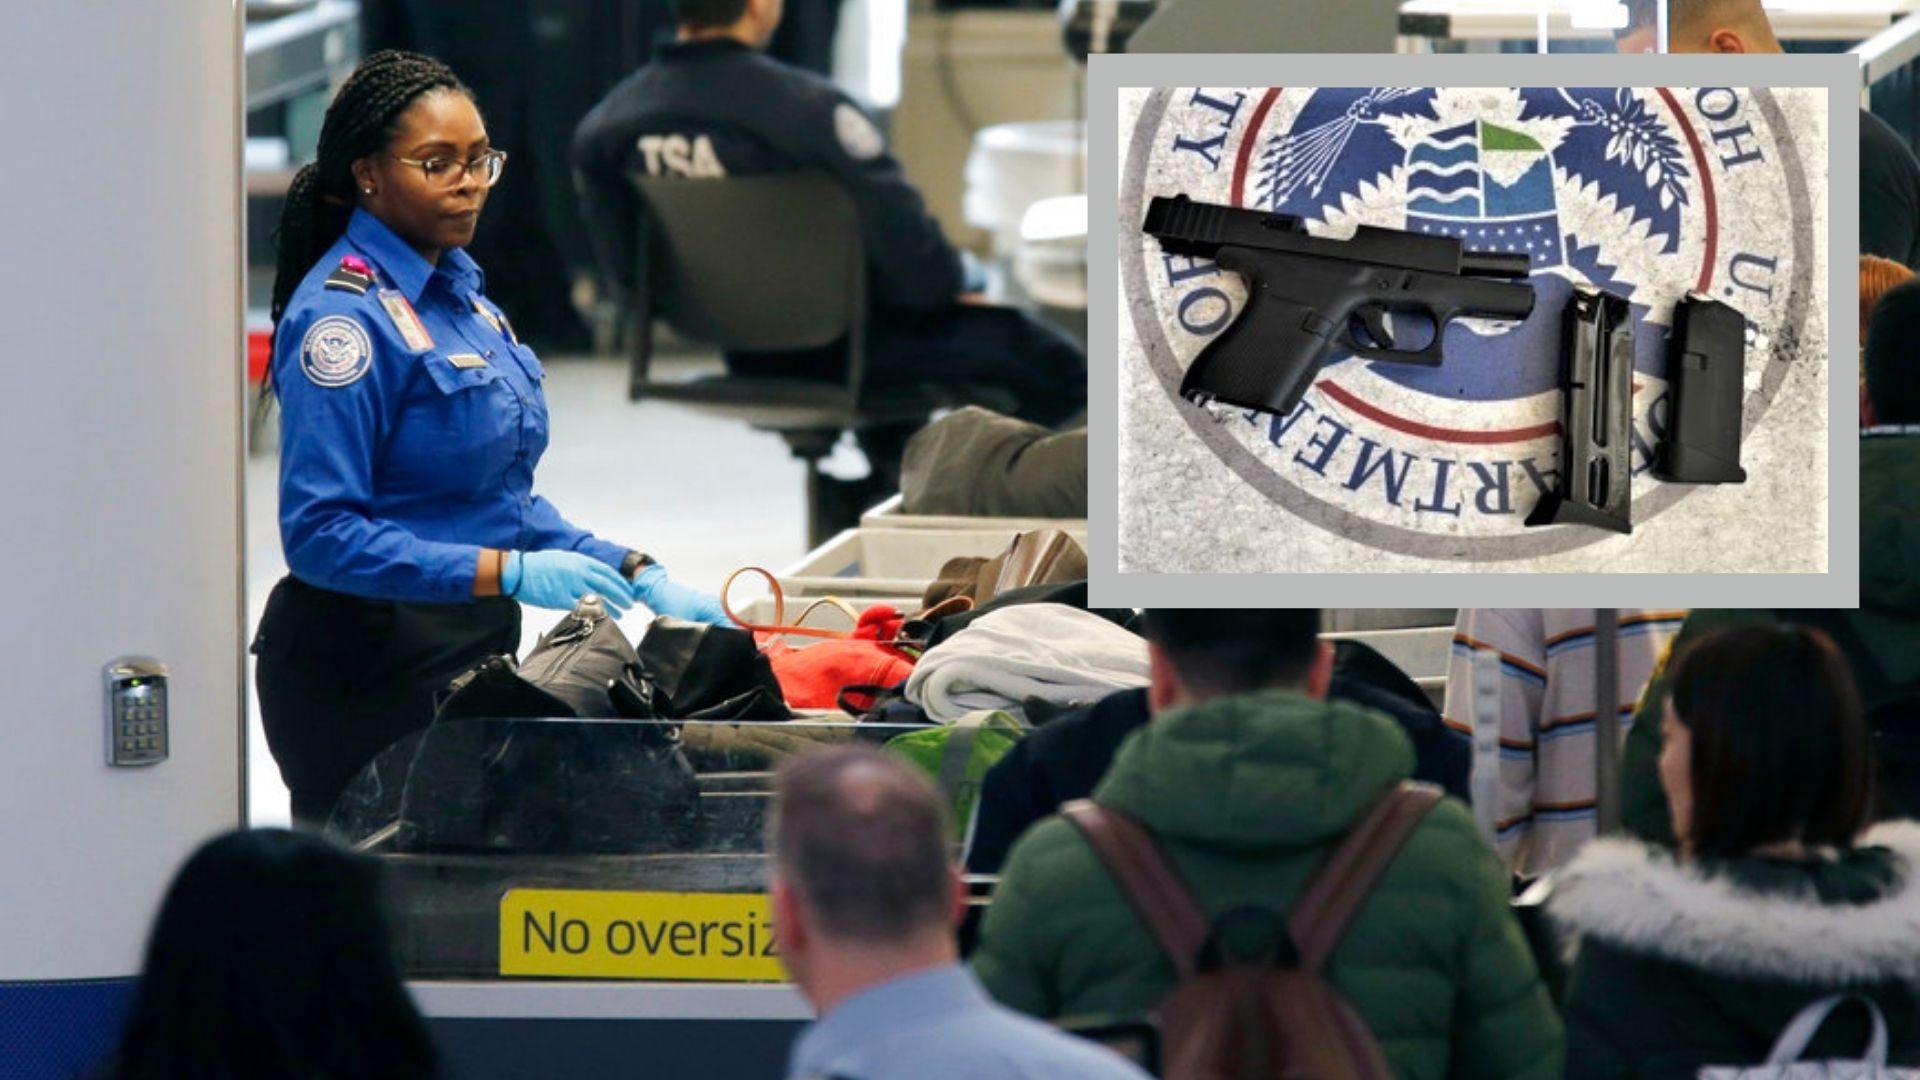 A TSA checkpoint in Newark Airport and a handgun confiscated by TSA officers